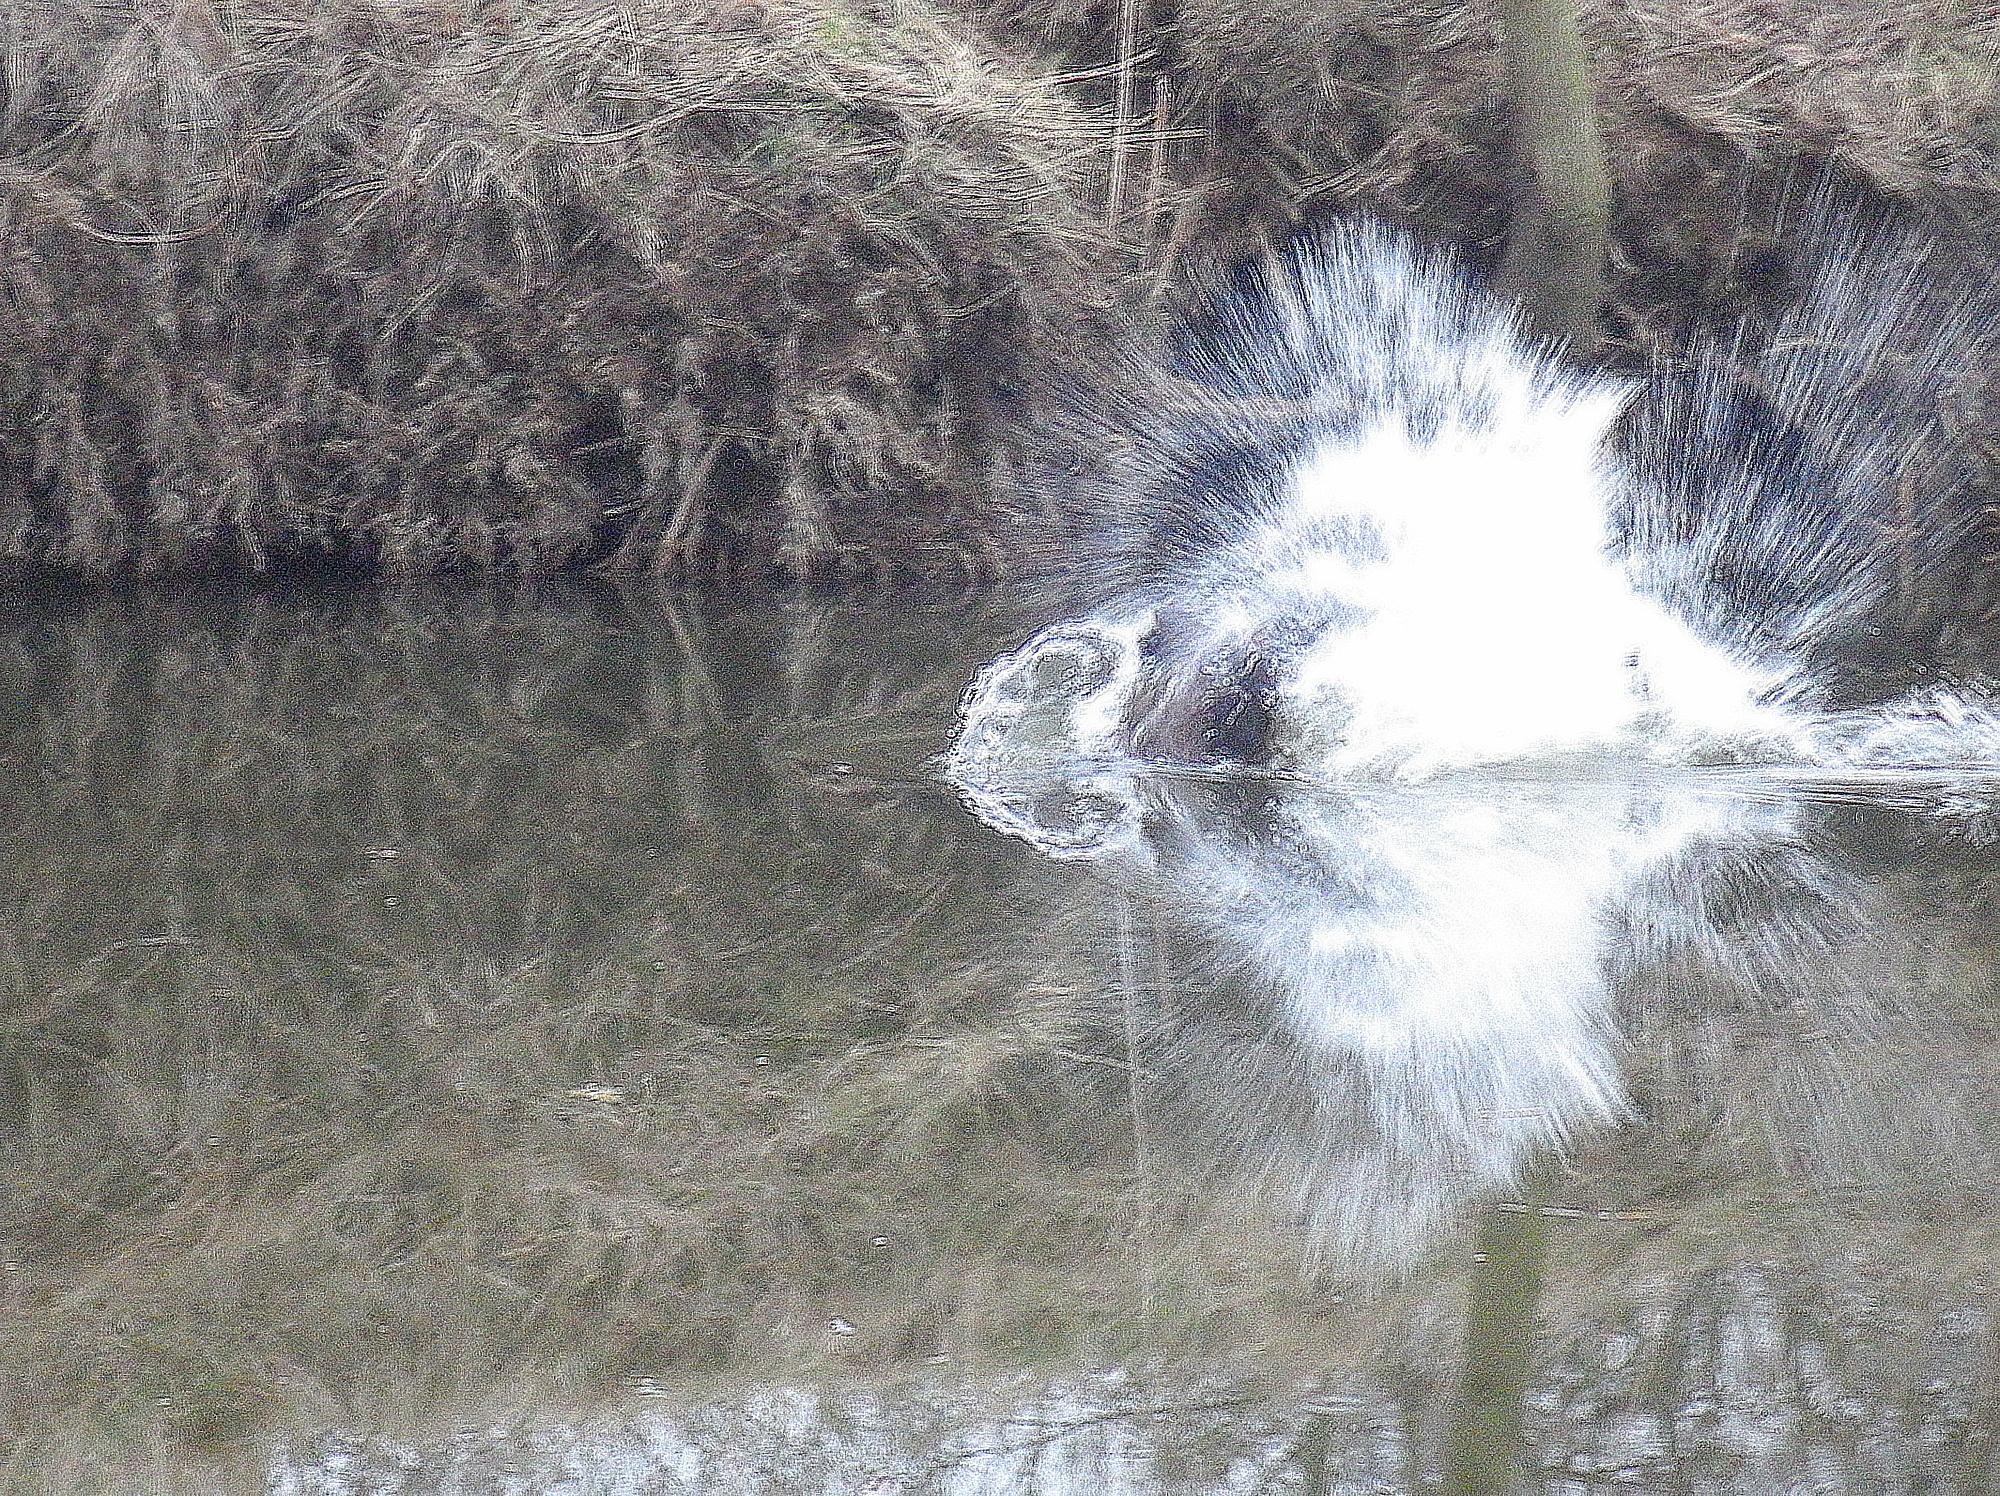 Radbuza Chobotnice bobr